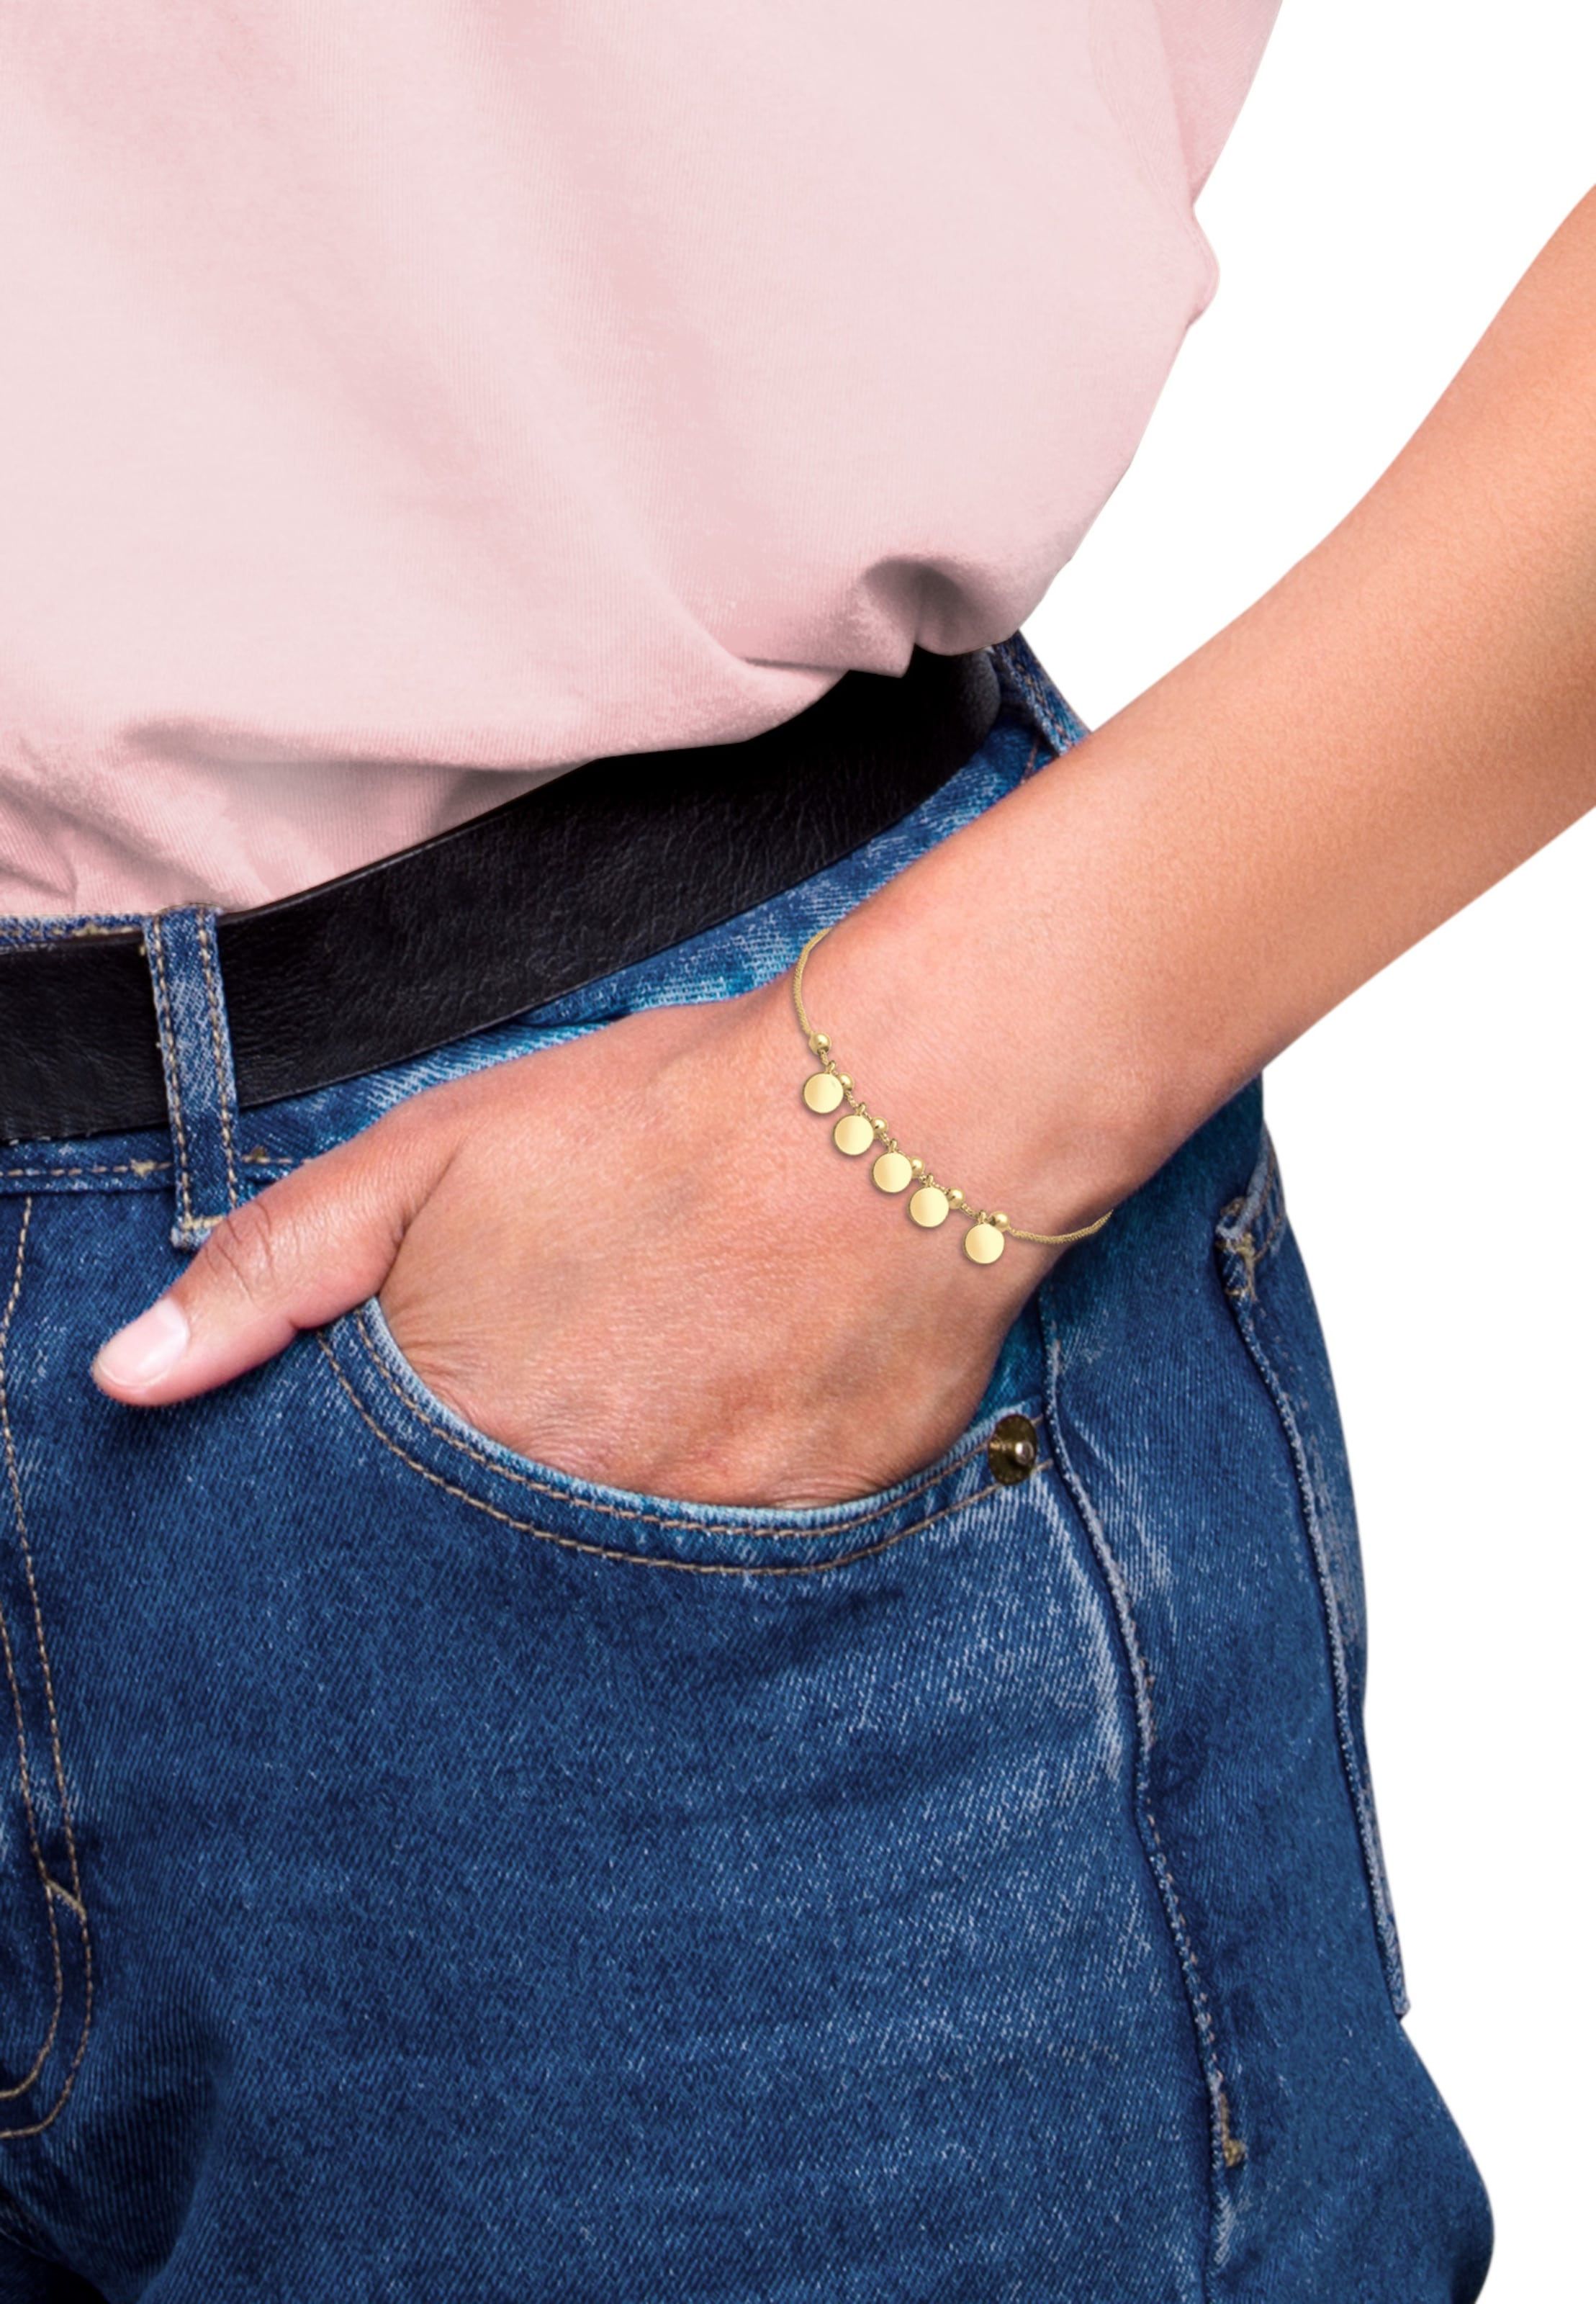 Elli Elli In Armband Armband 'geo' Armband Elli Gold 'geo' In Gold In 'geo' mwnv8ON0